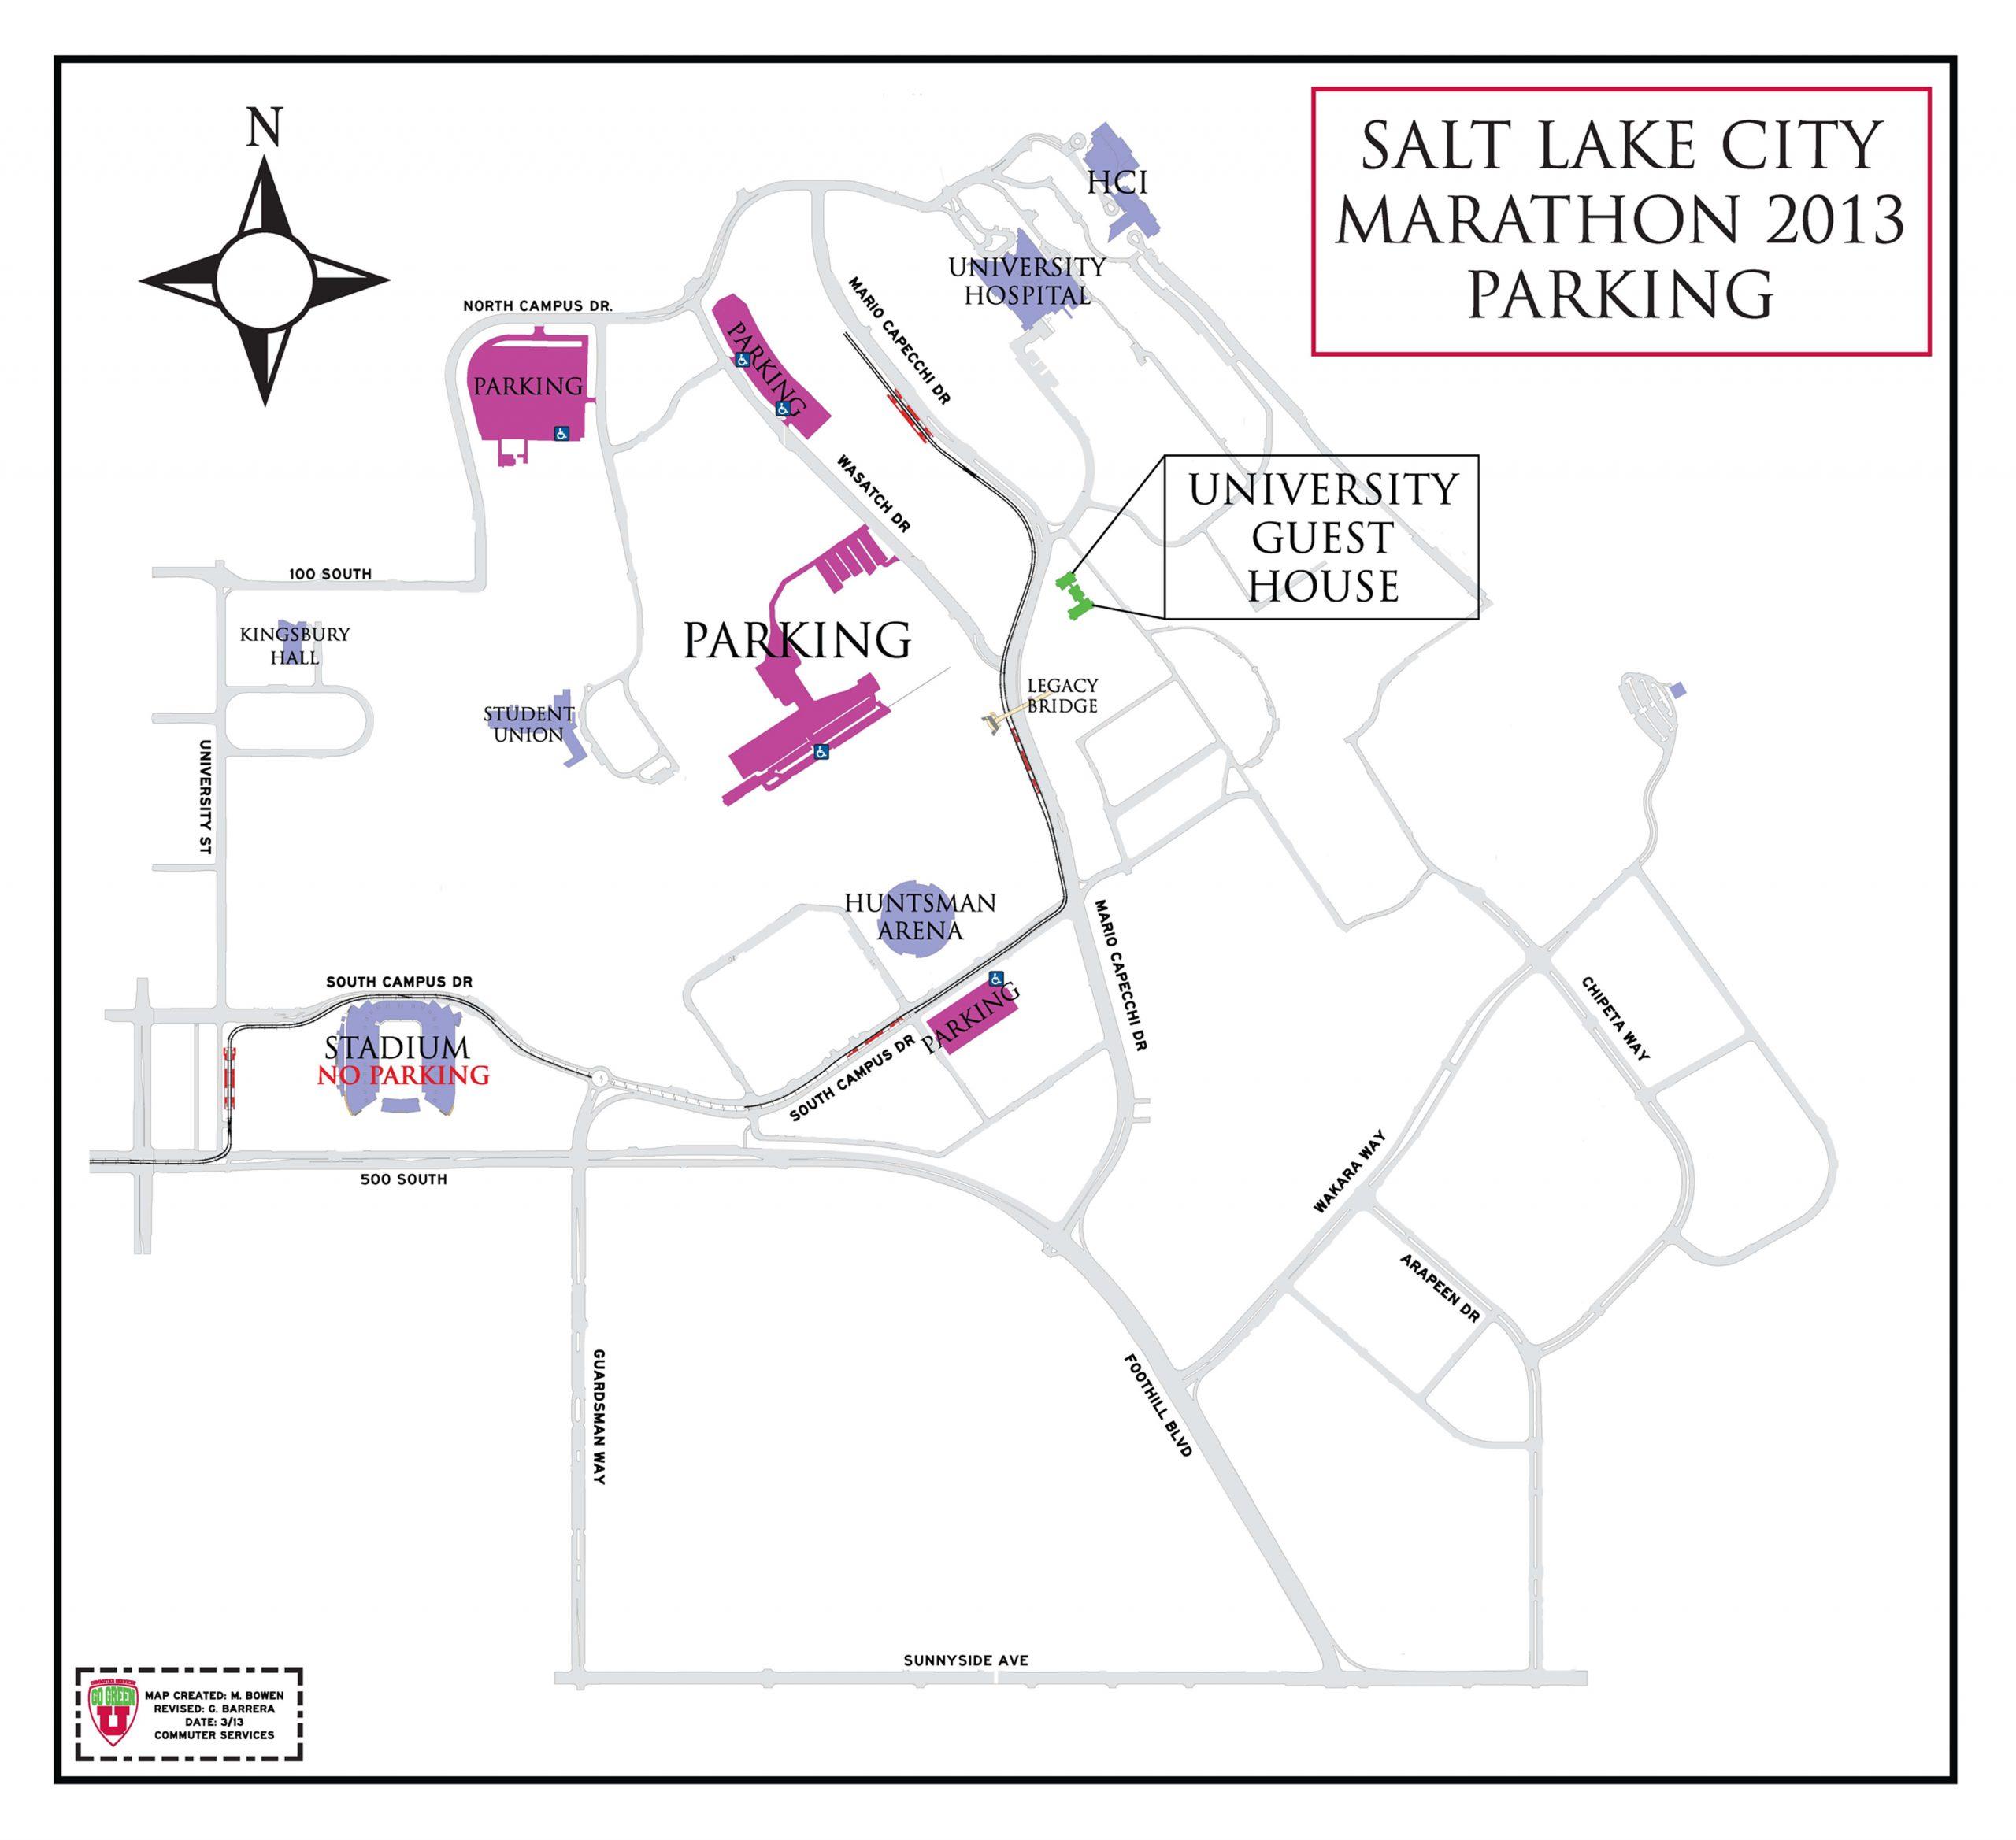 2013 Salt Lake City Marathon, University of Utah Parking Map.